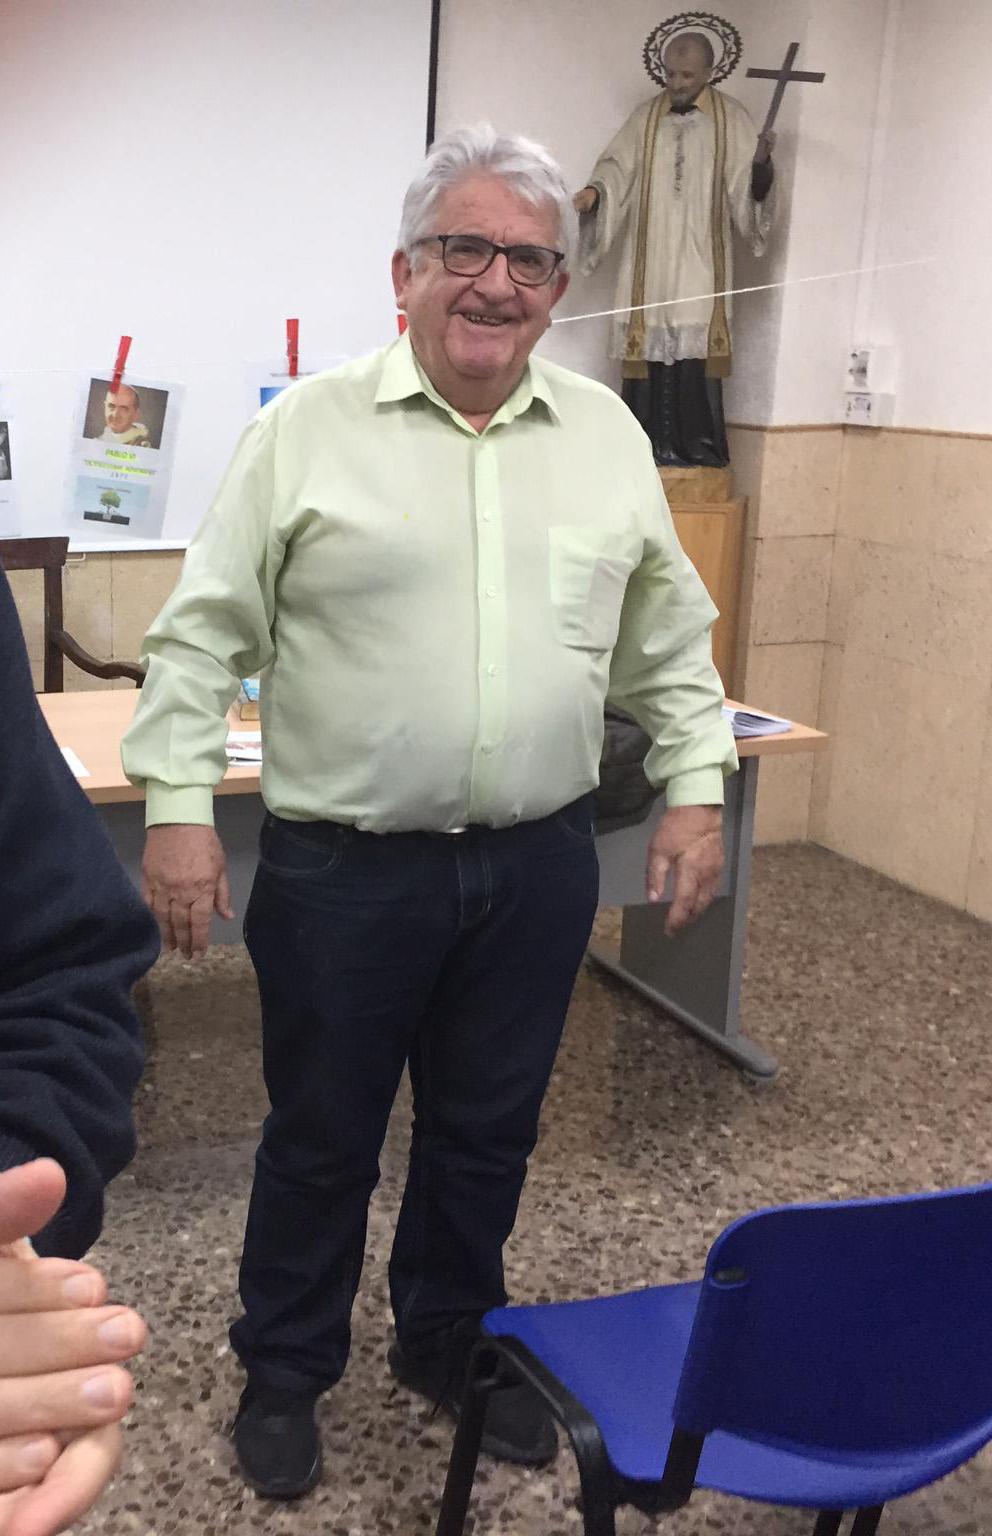 encuentro FV albacete nov 2019 13